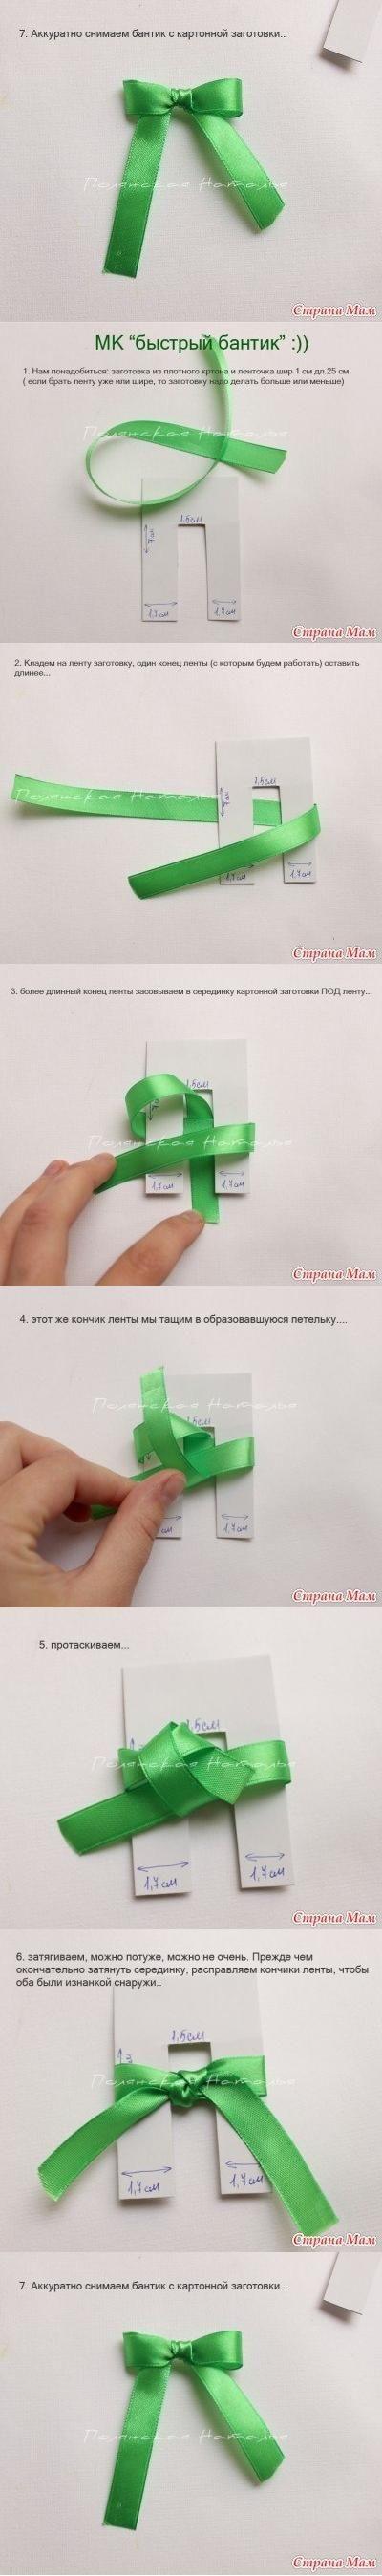 Faire une joli noeud : méthode 2